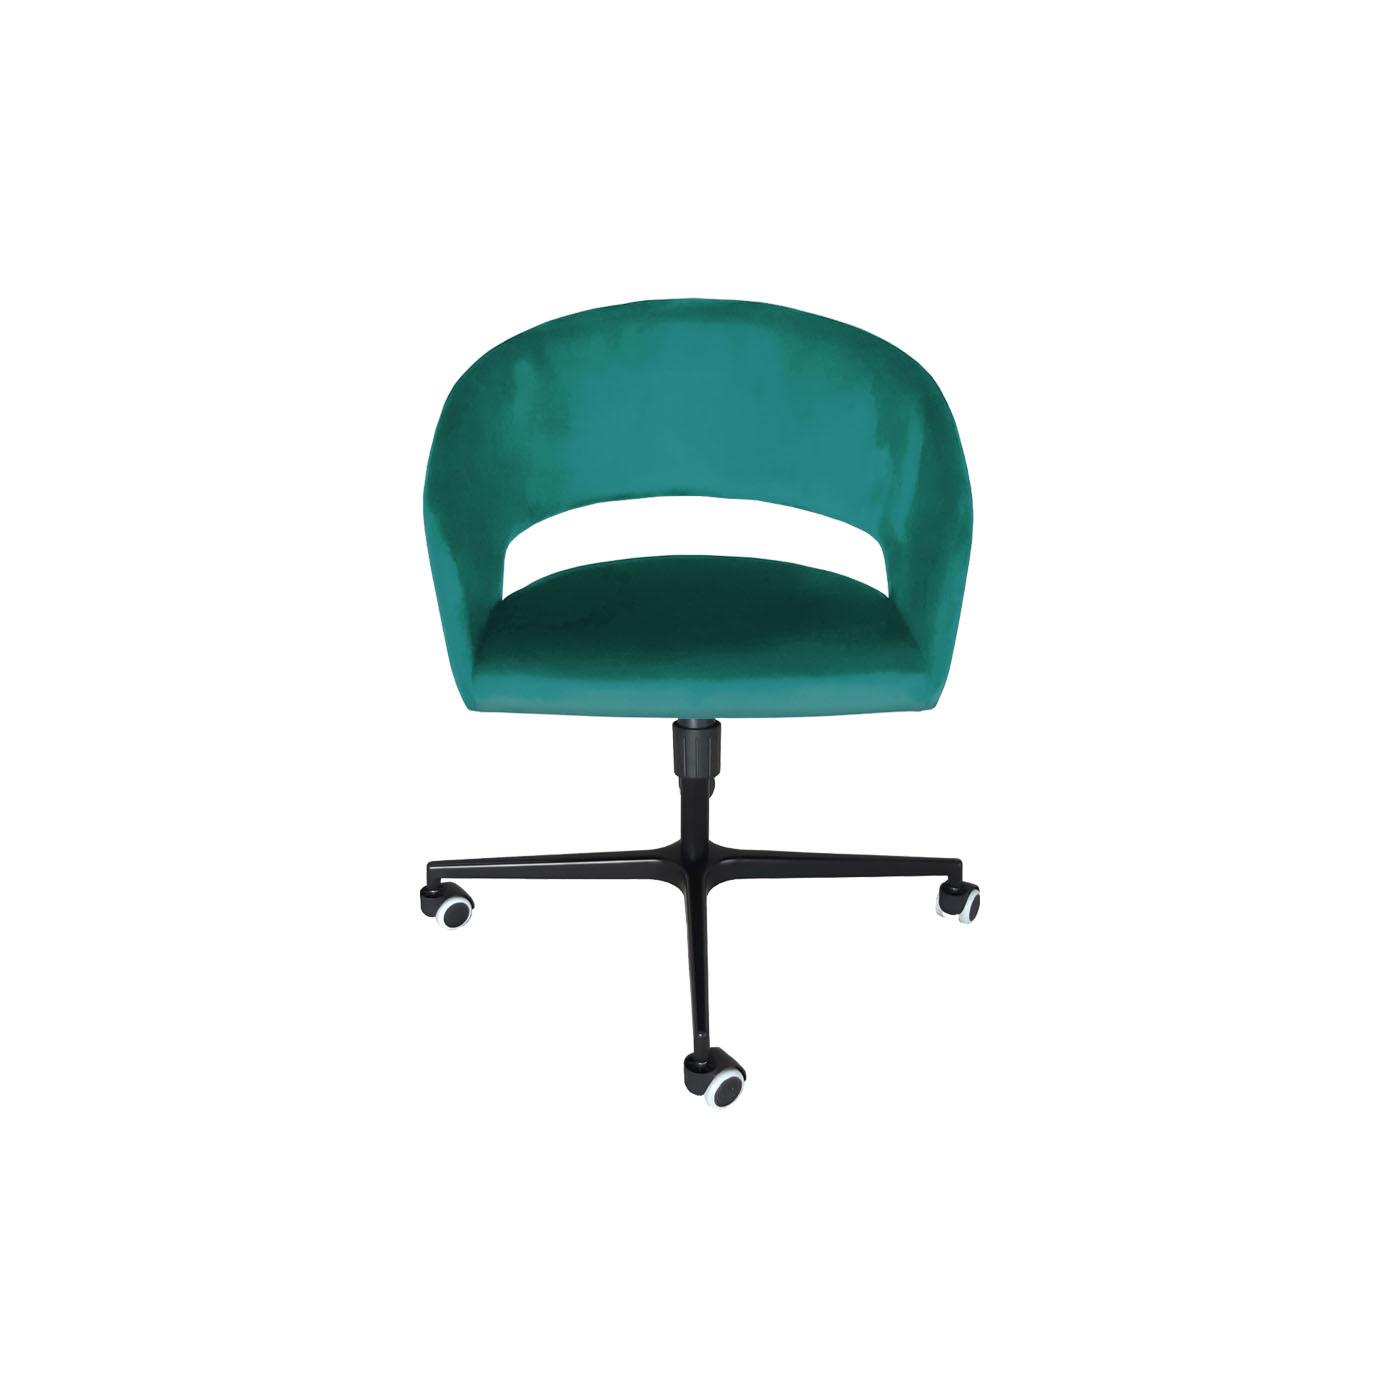 Ostrava Turquoise Work Chair